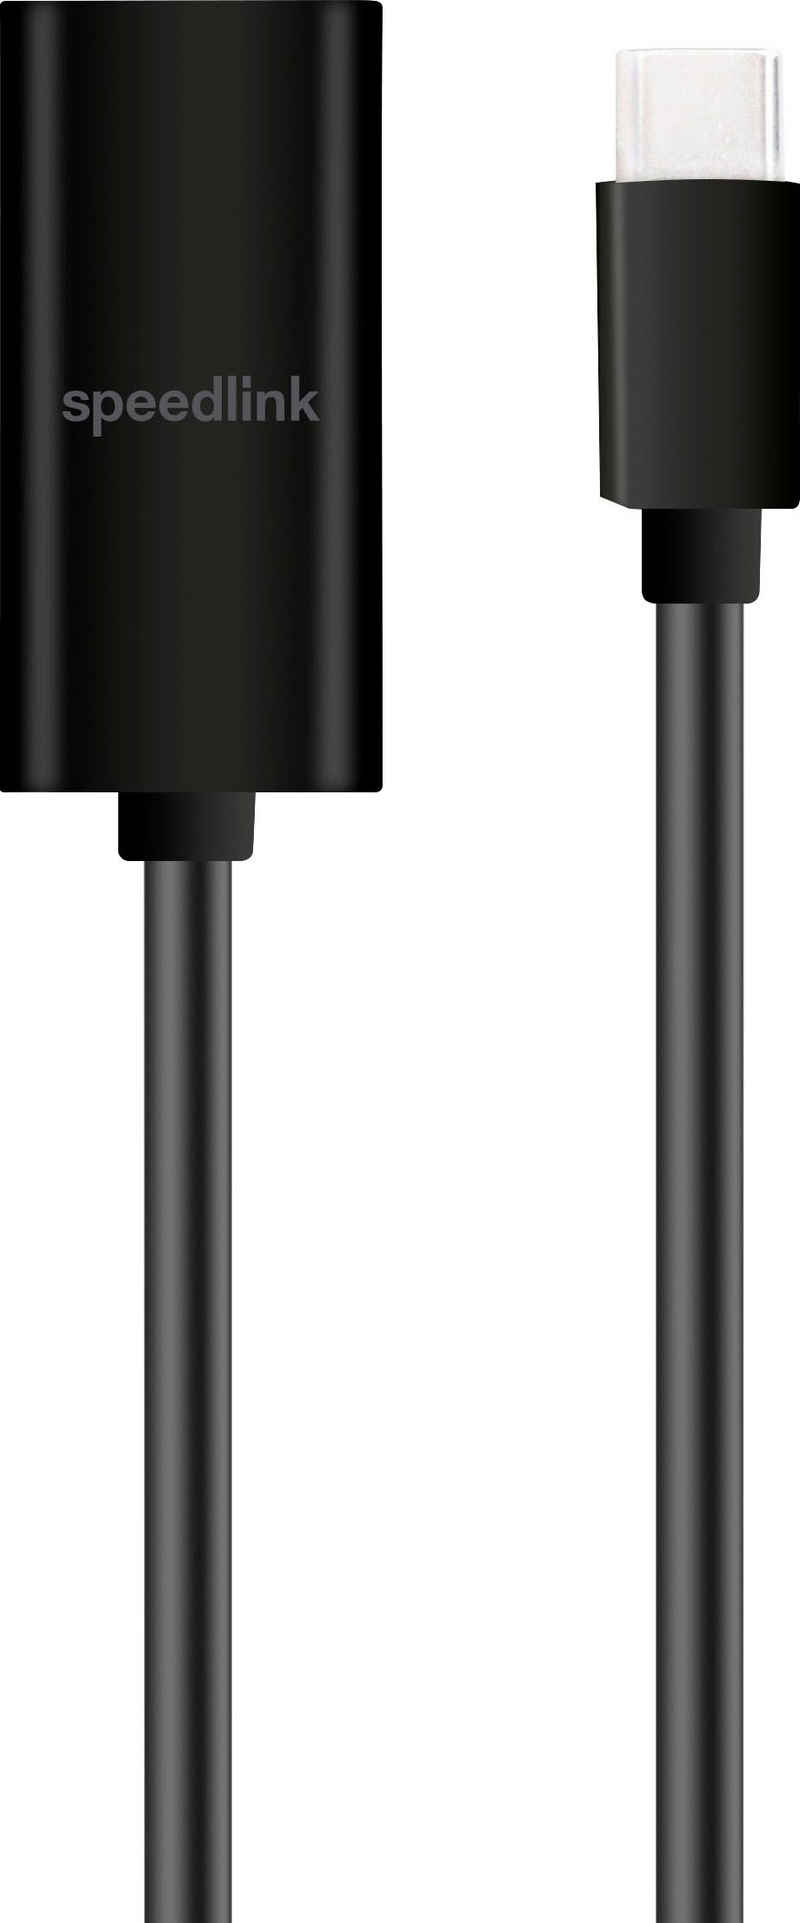 Speedlink »USB-C zu DisplayPort Adapter HQ« Laptop-Adapter USB-C